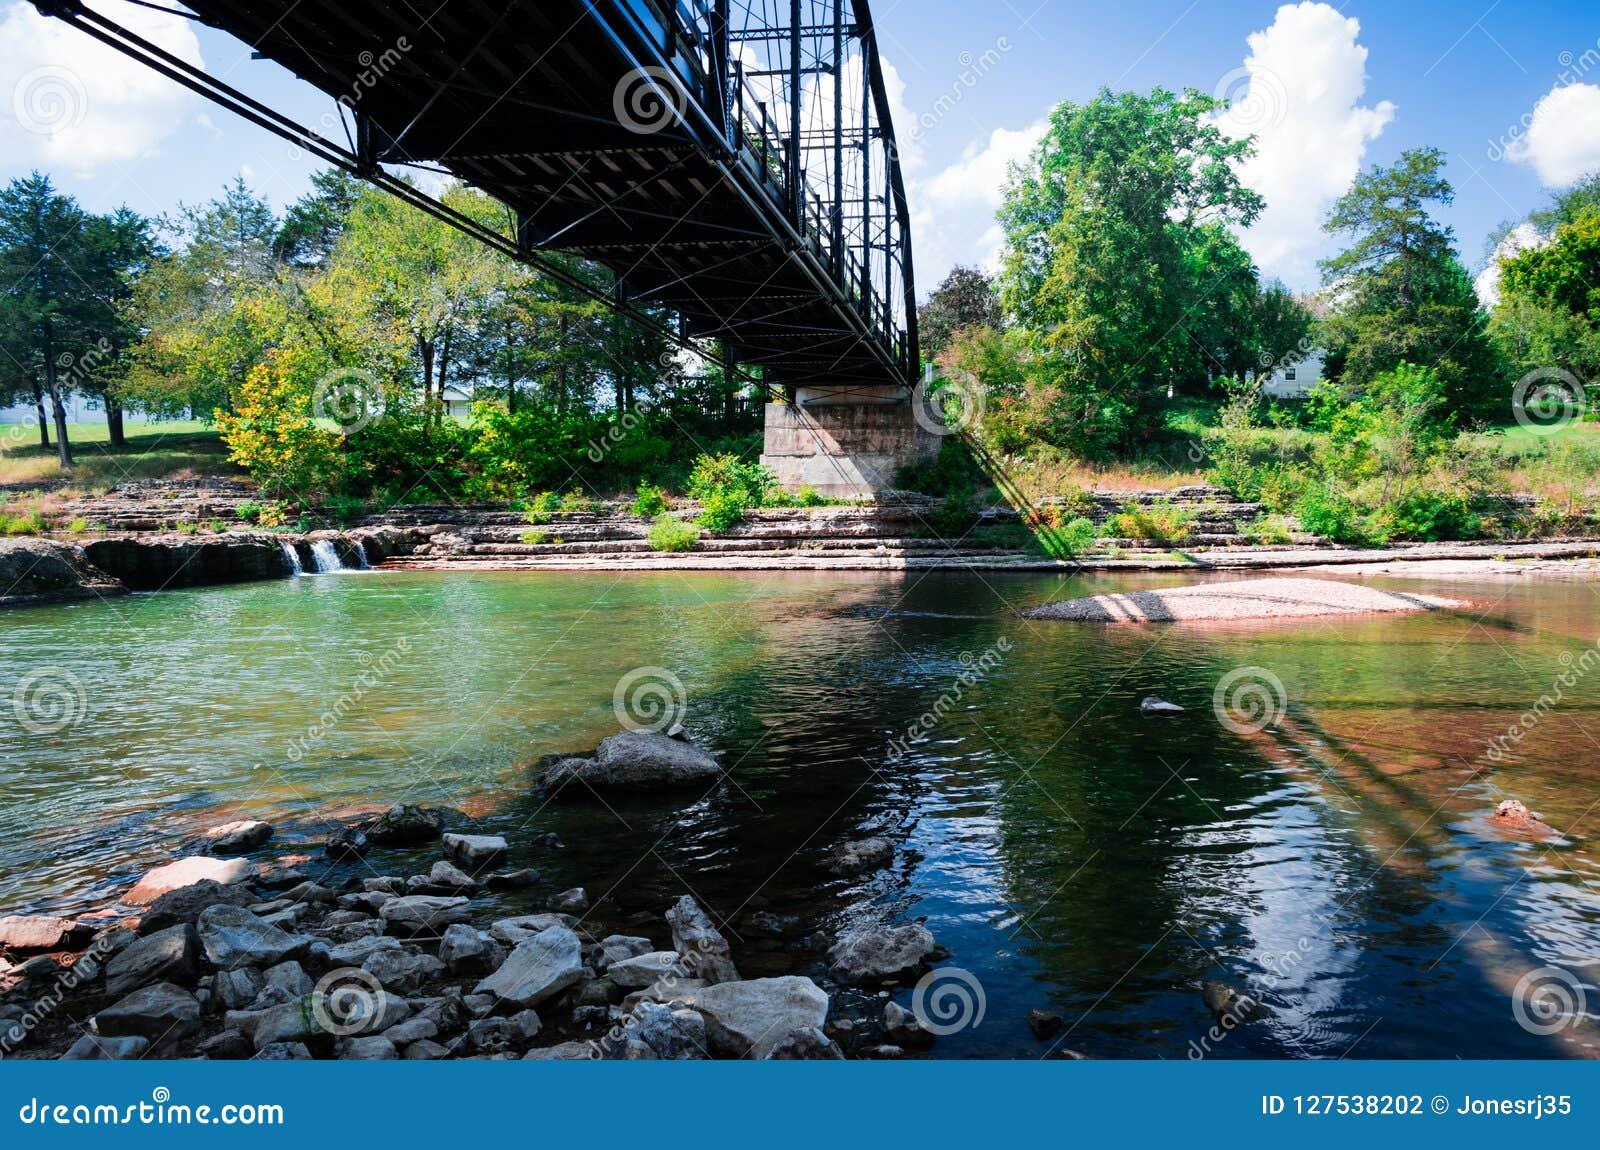 A ponte velha molda sombras coloridas nas rochas no rio abaixo